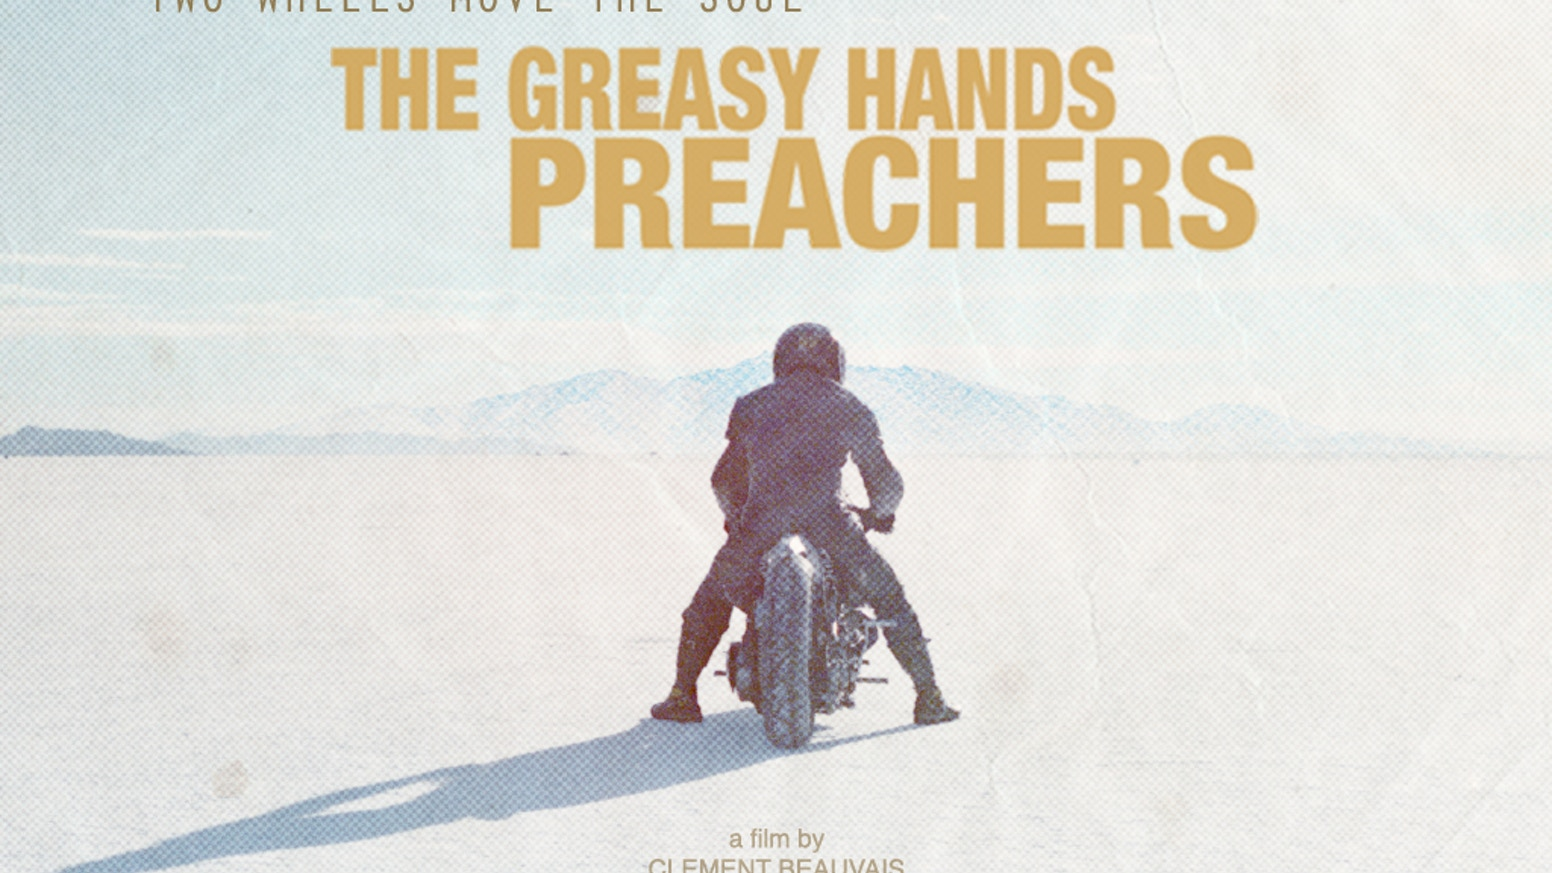 THE GREASY HANDS PREACHERS DOCUMENTARY by Clement & Arthur — Kickstarter